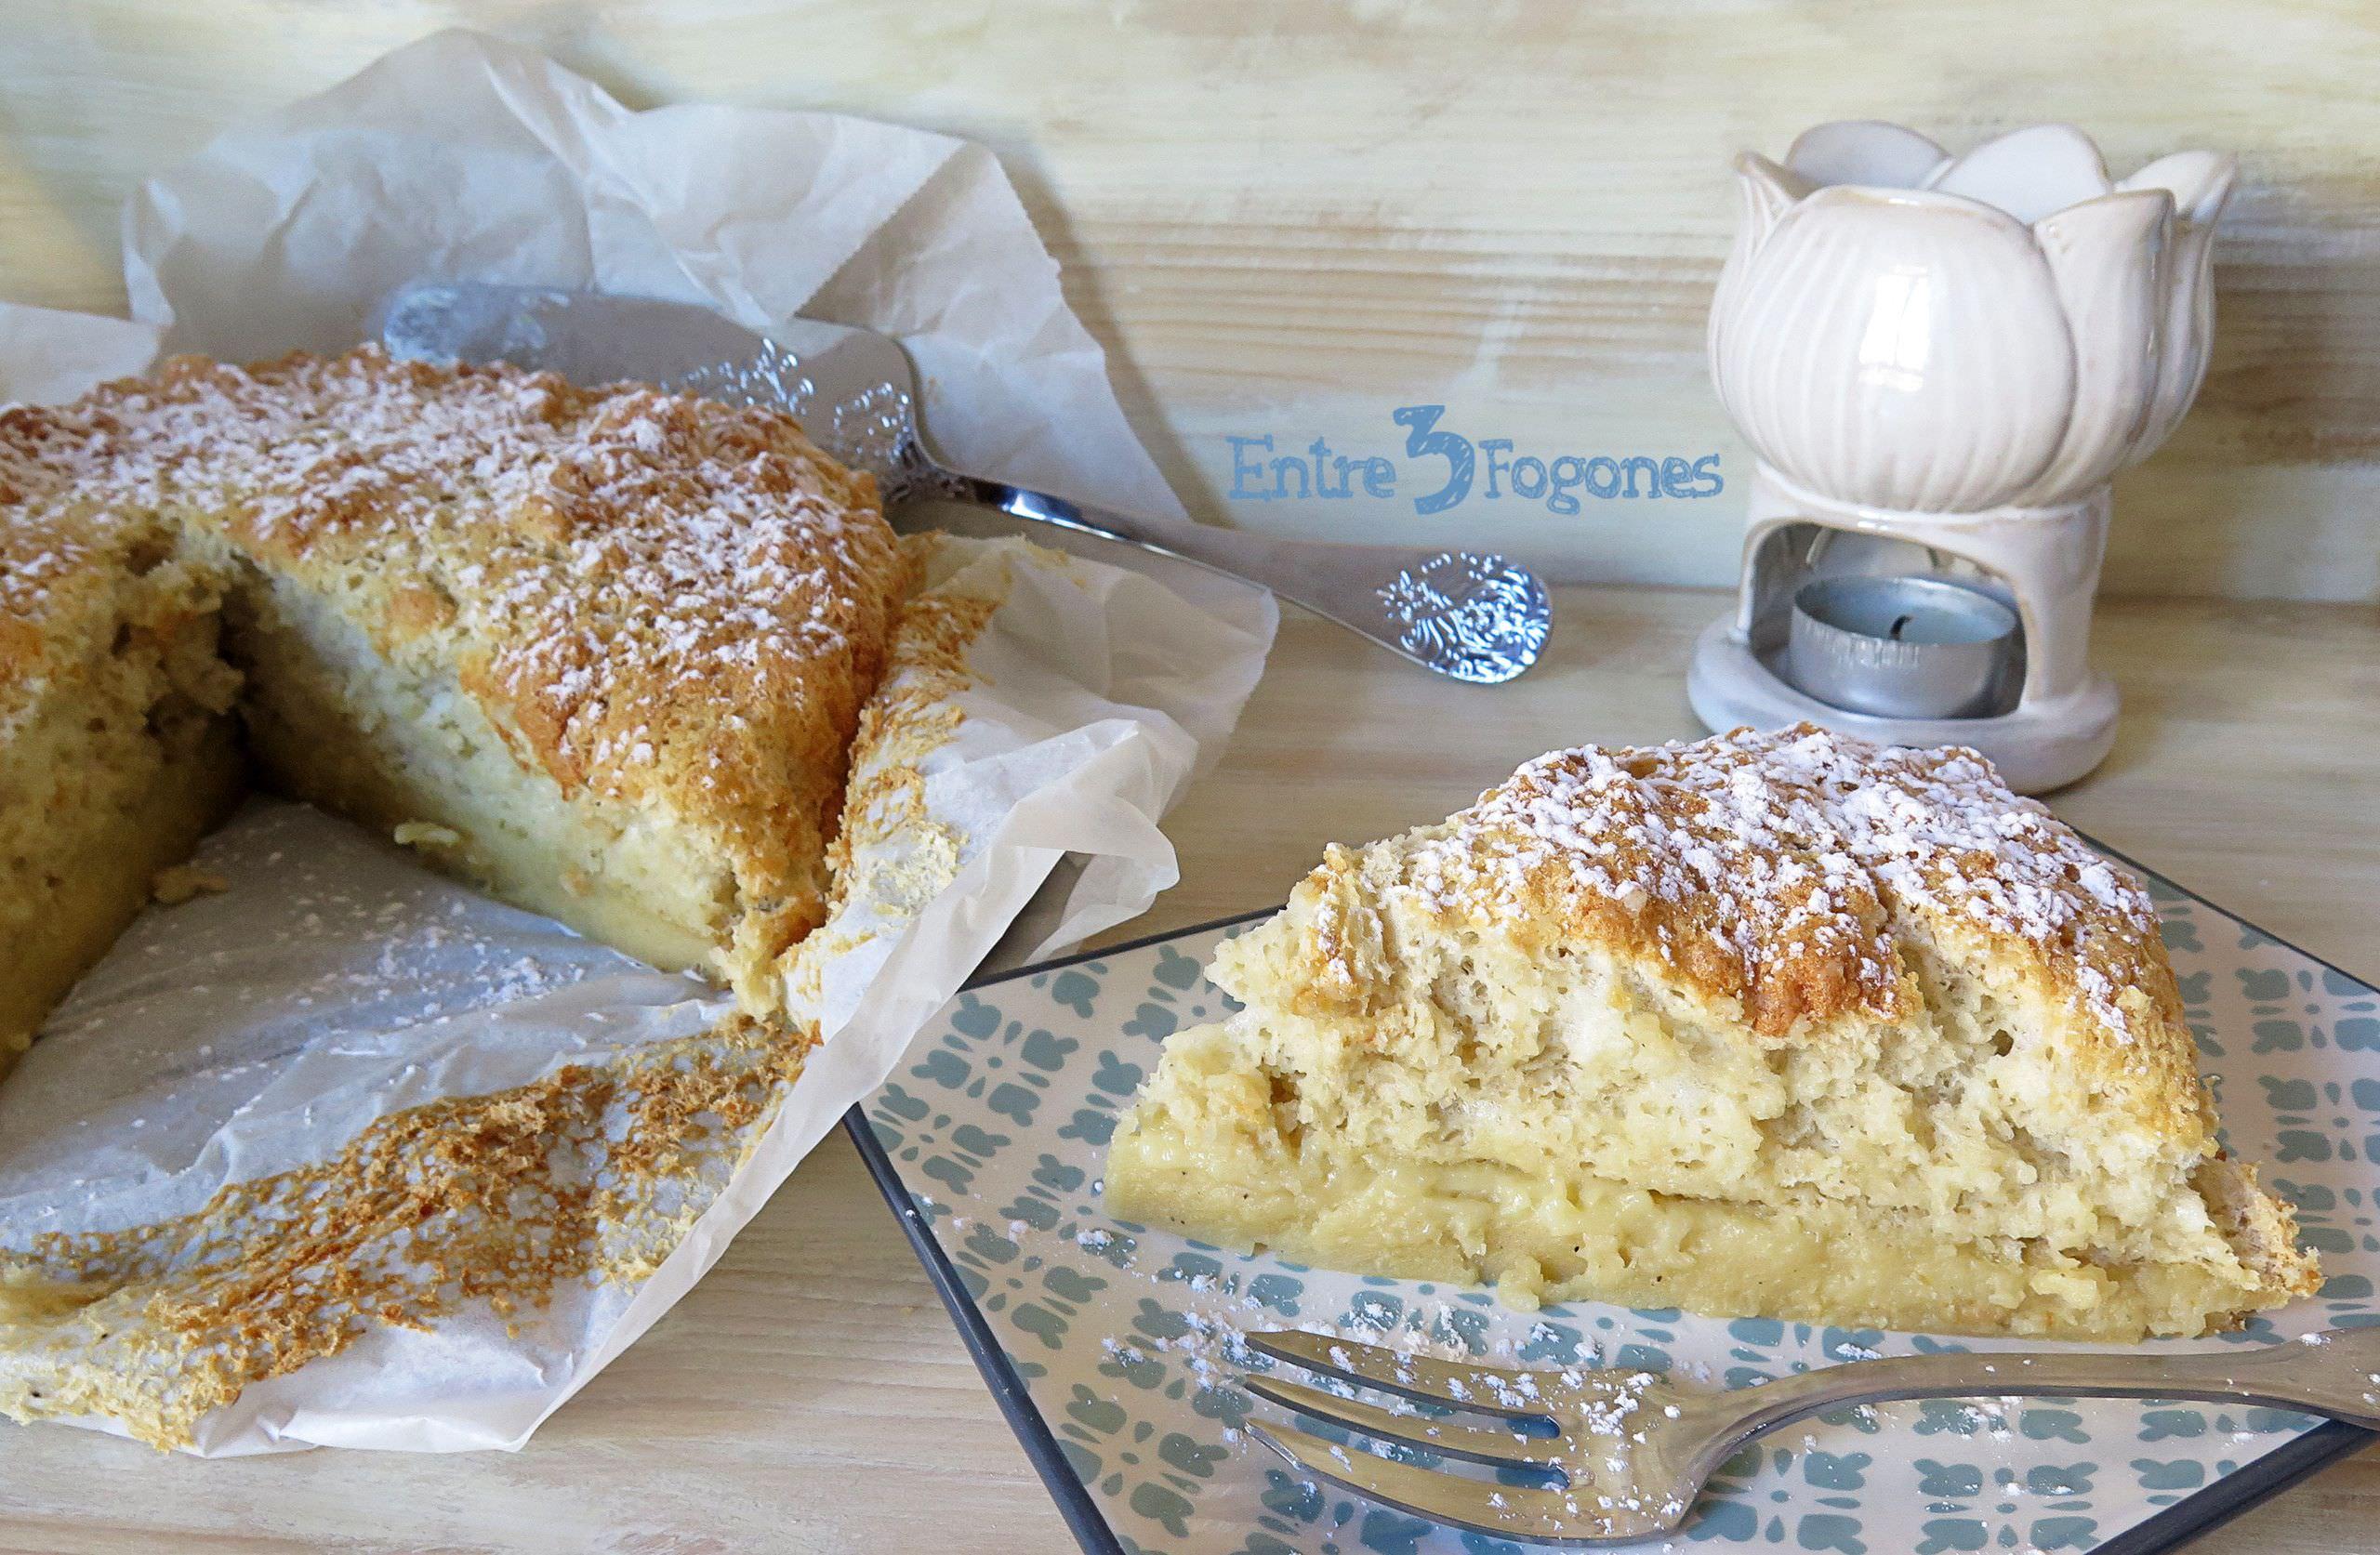 Receta Bizcocho Esponjoso Mágico o Gâteau Éponge Magique